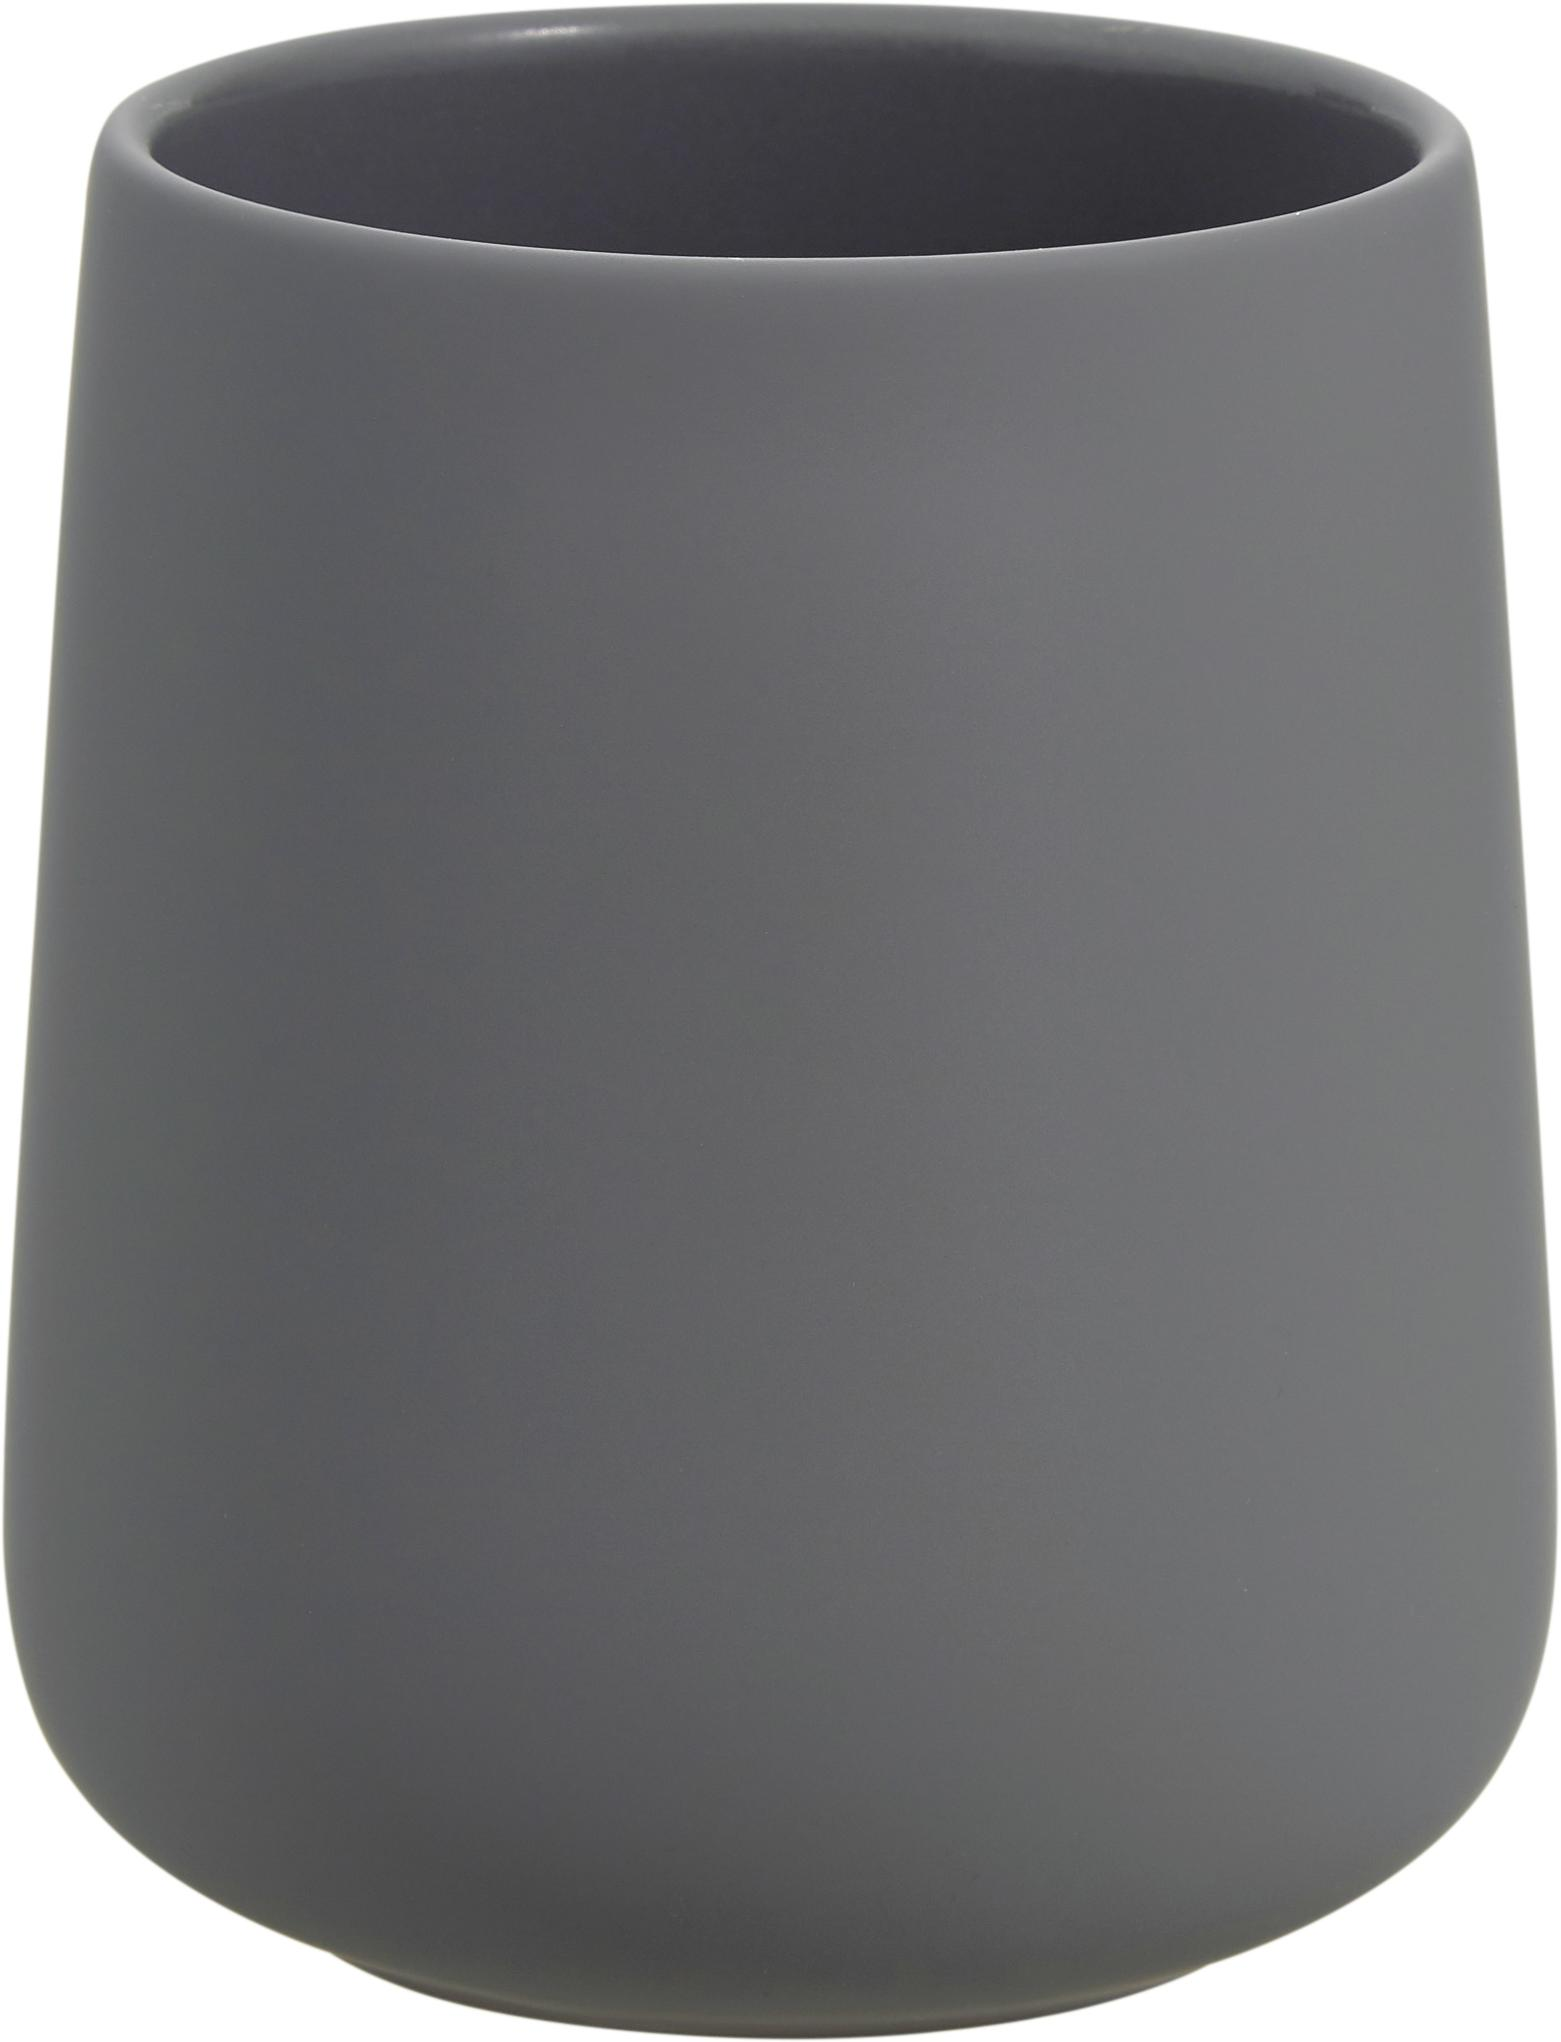 Porta spazzolini in porcellana Clean, Porcellana, Grigio, Ø 8 x Alt. 10 cm